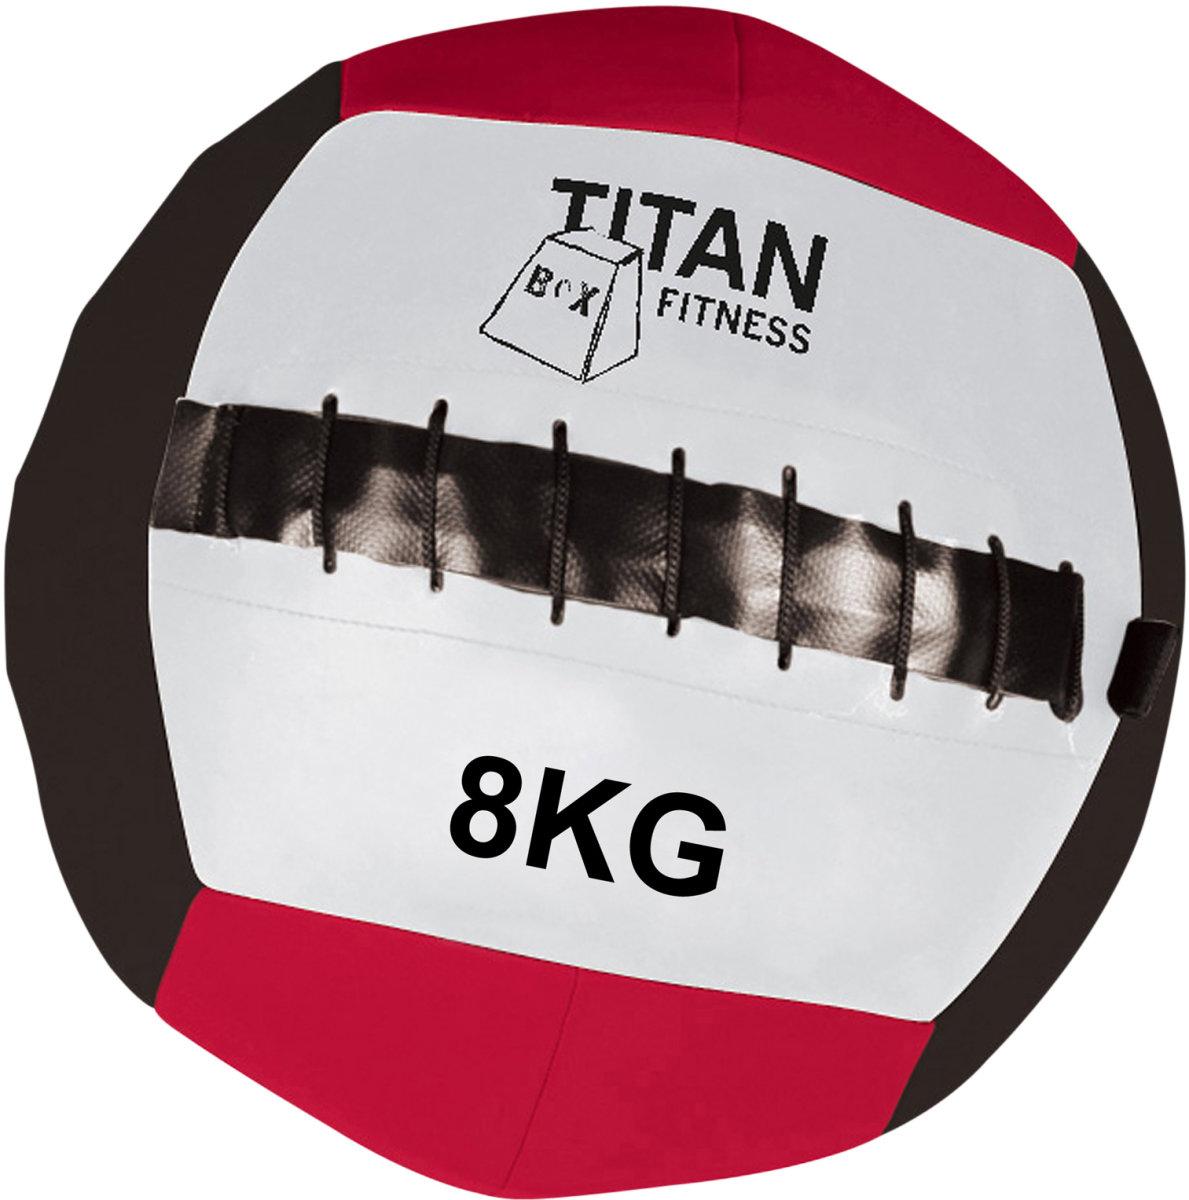 Titan Crossfit Rage Ball, 8 kg